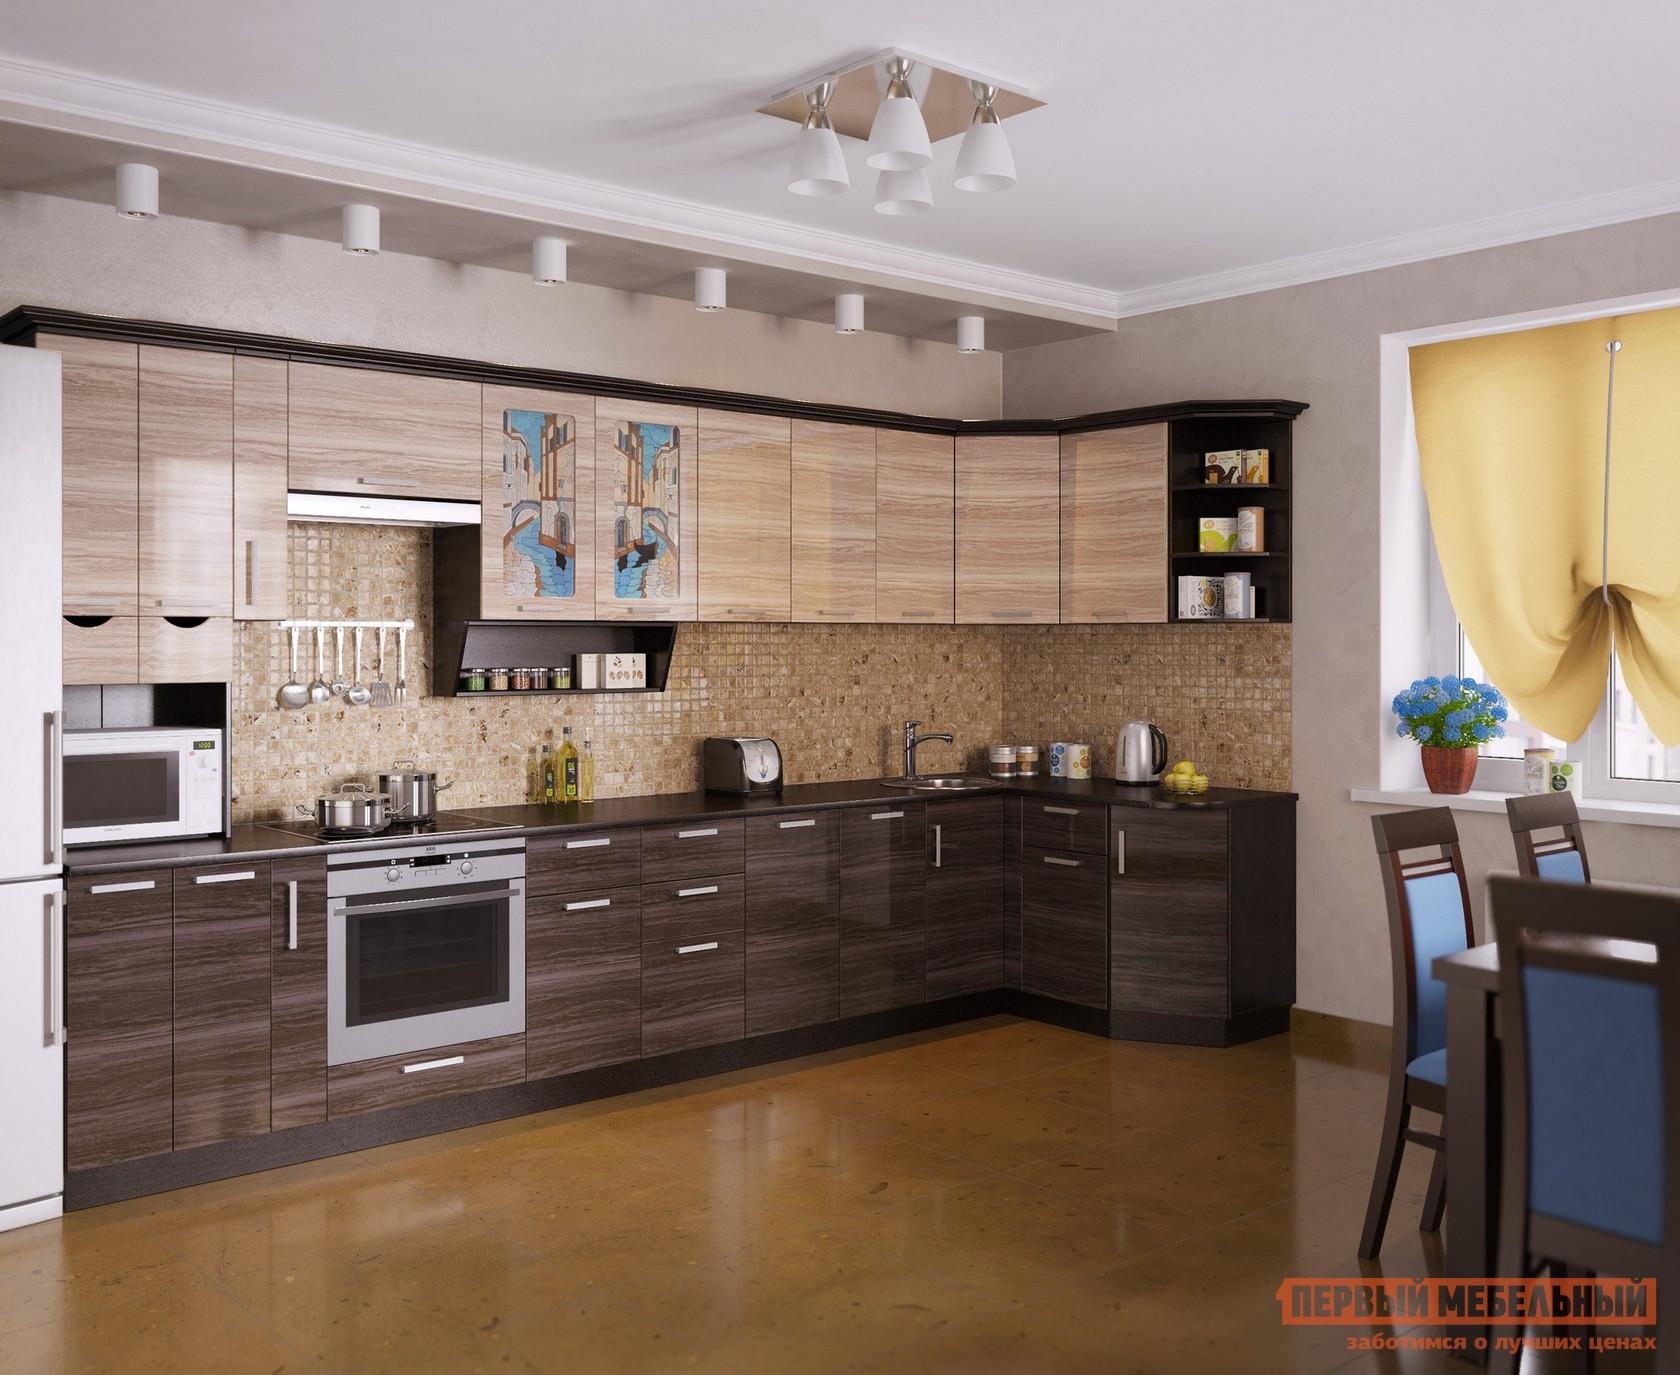 Угловой кухонный гарнитур МО РОСТ Венеция 5 Угол кухонный гарнитур мо рост венеция 2 угол